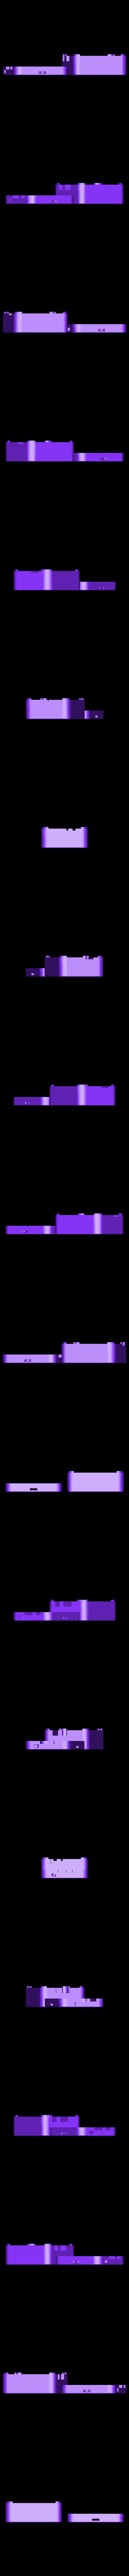 beagle_bone_dual_print_big.stl Download free STL file Beagle Bone Case • 3D printable design, Obenottr3D